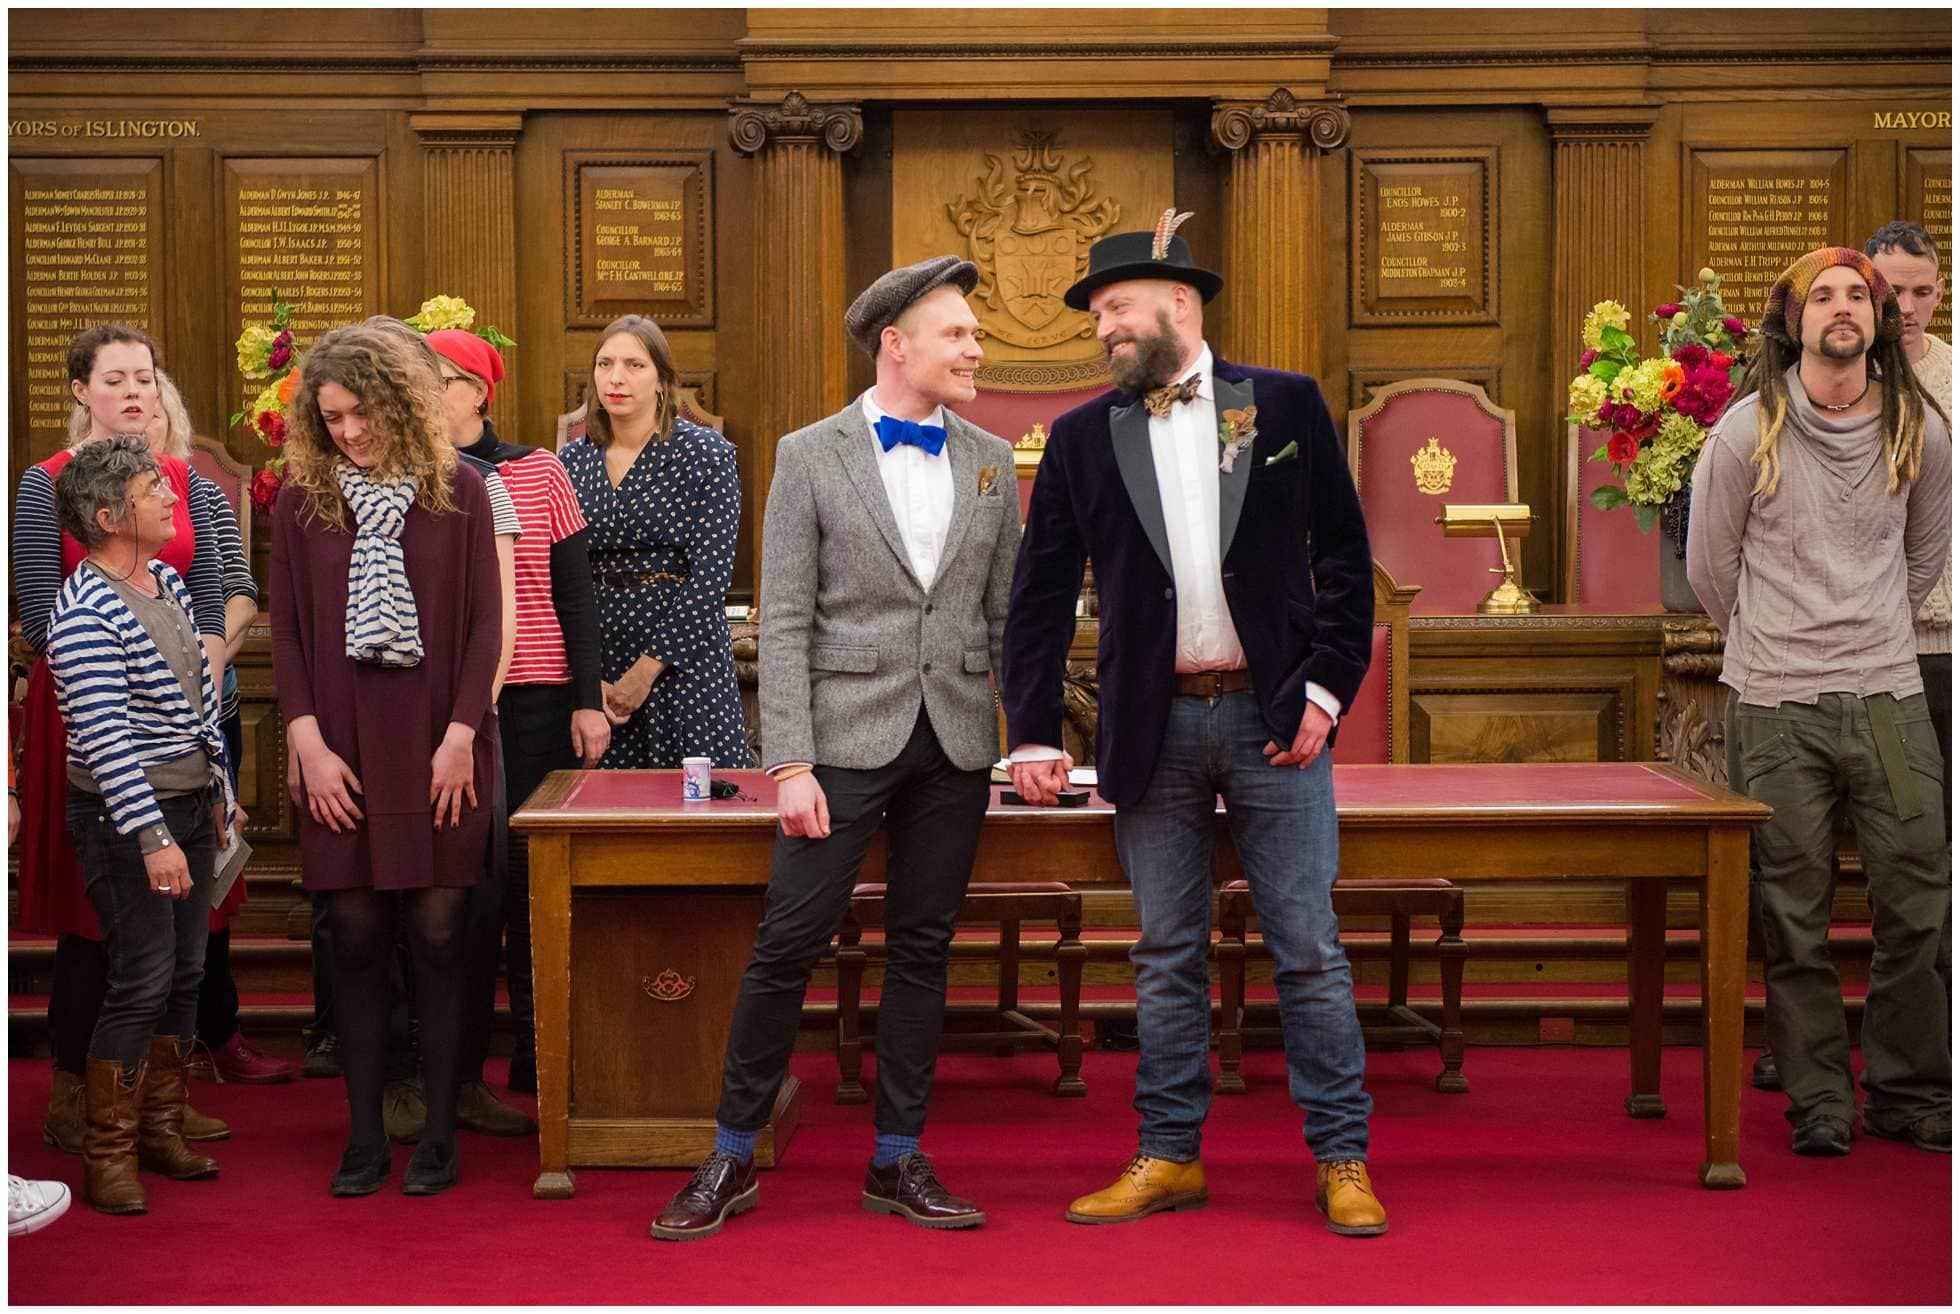 The happy couple gay wedding photography islington town hall